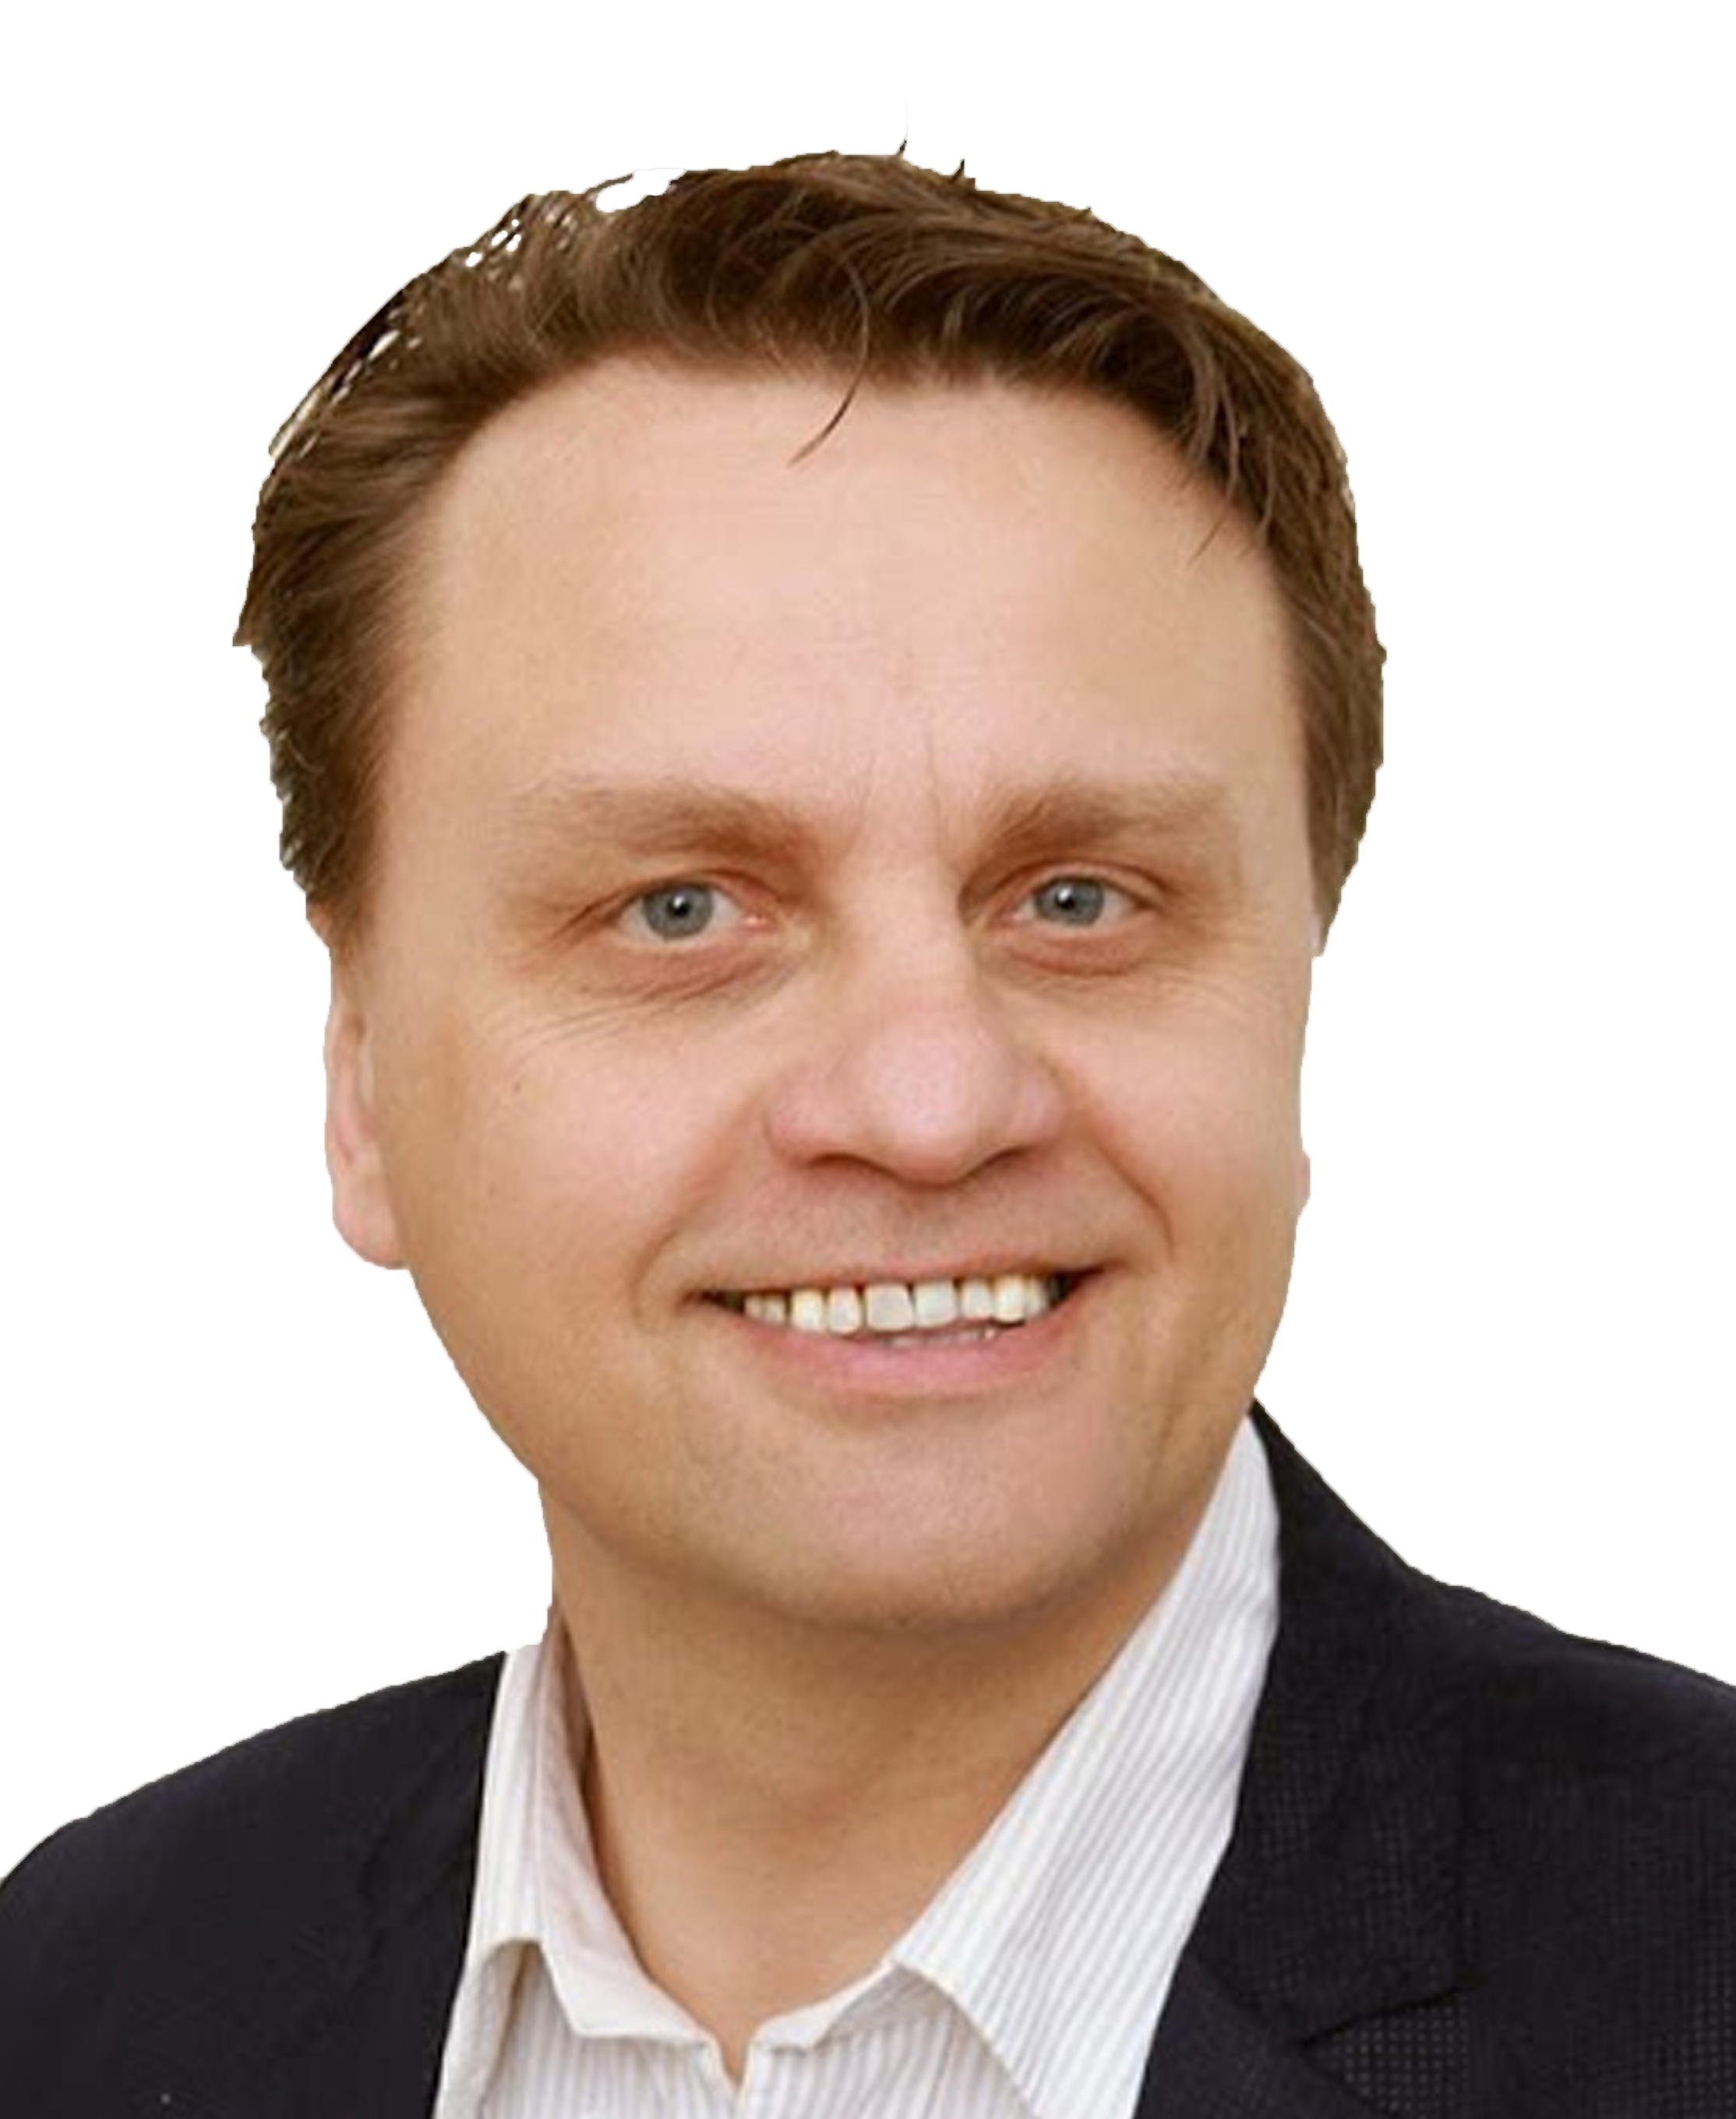 Miroslav Marušák